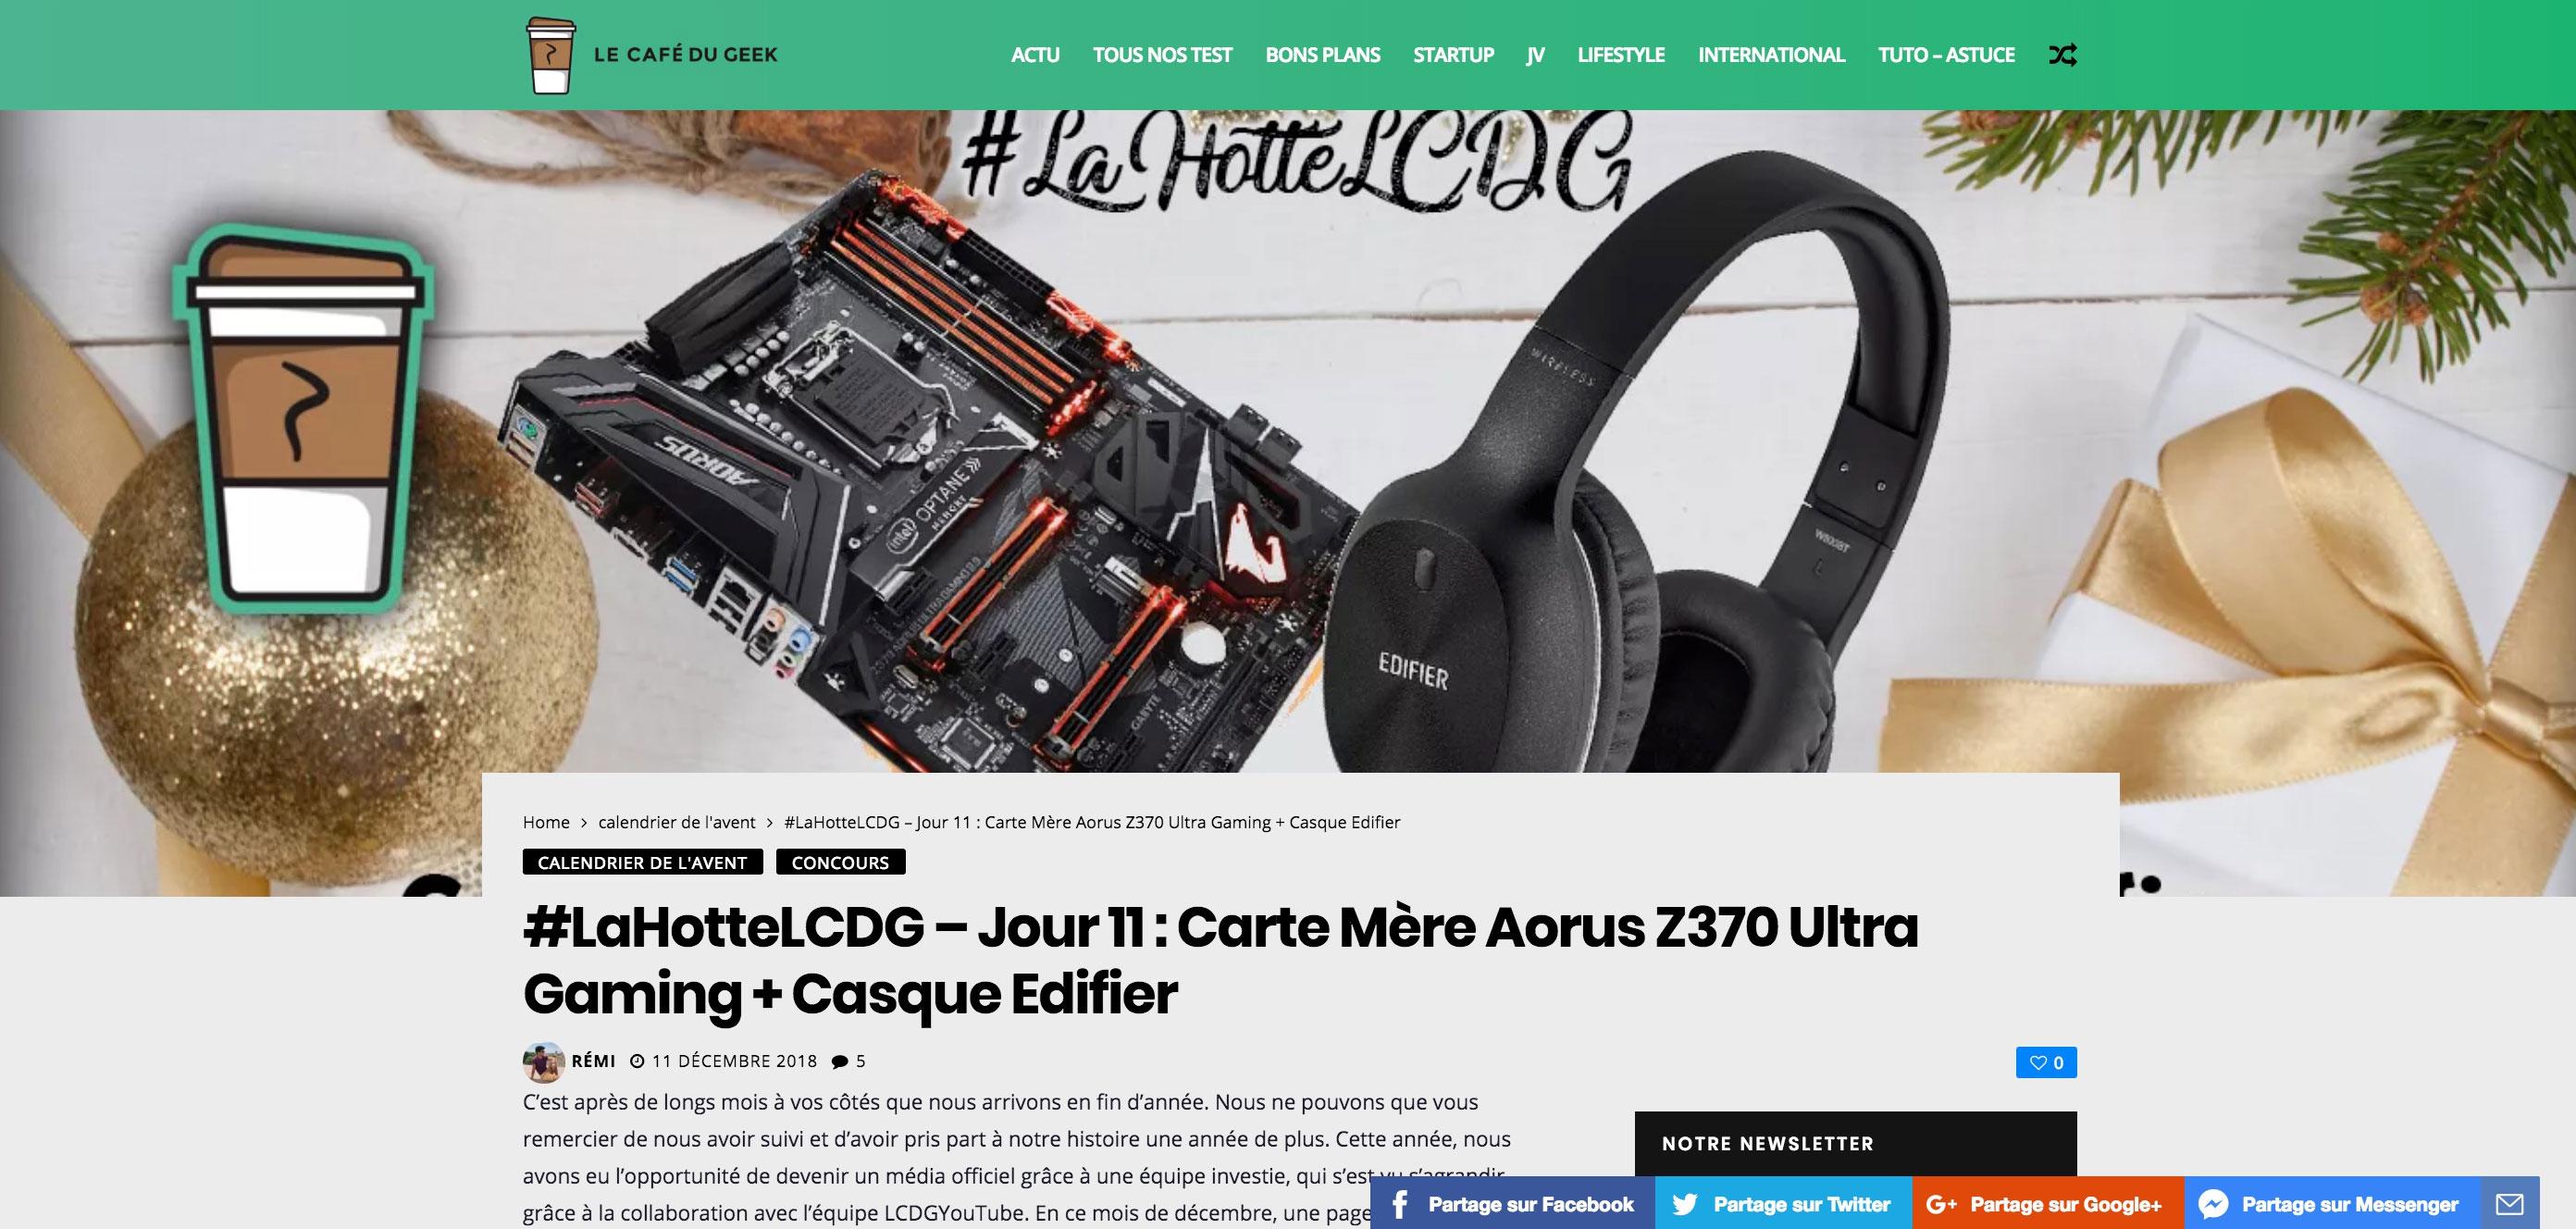 #LaHotteLCDG - Day 11: Motherboard Aorus Z370 Ultra Gaming + Headphone Edifier